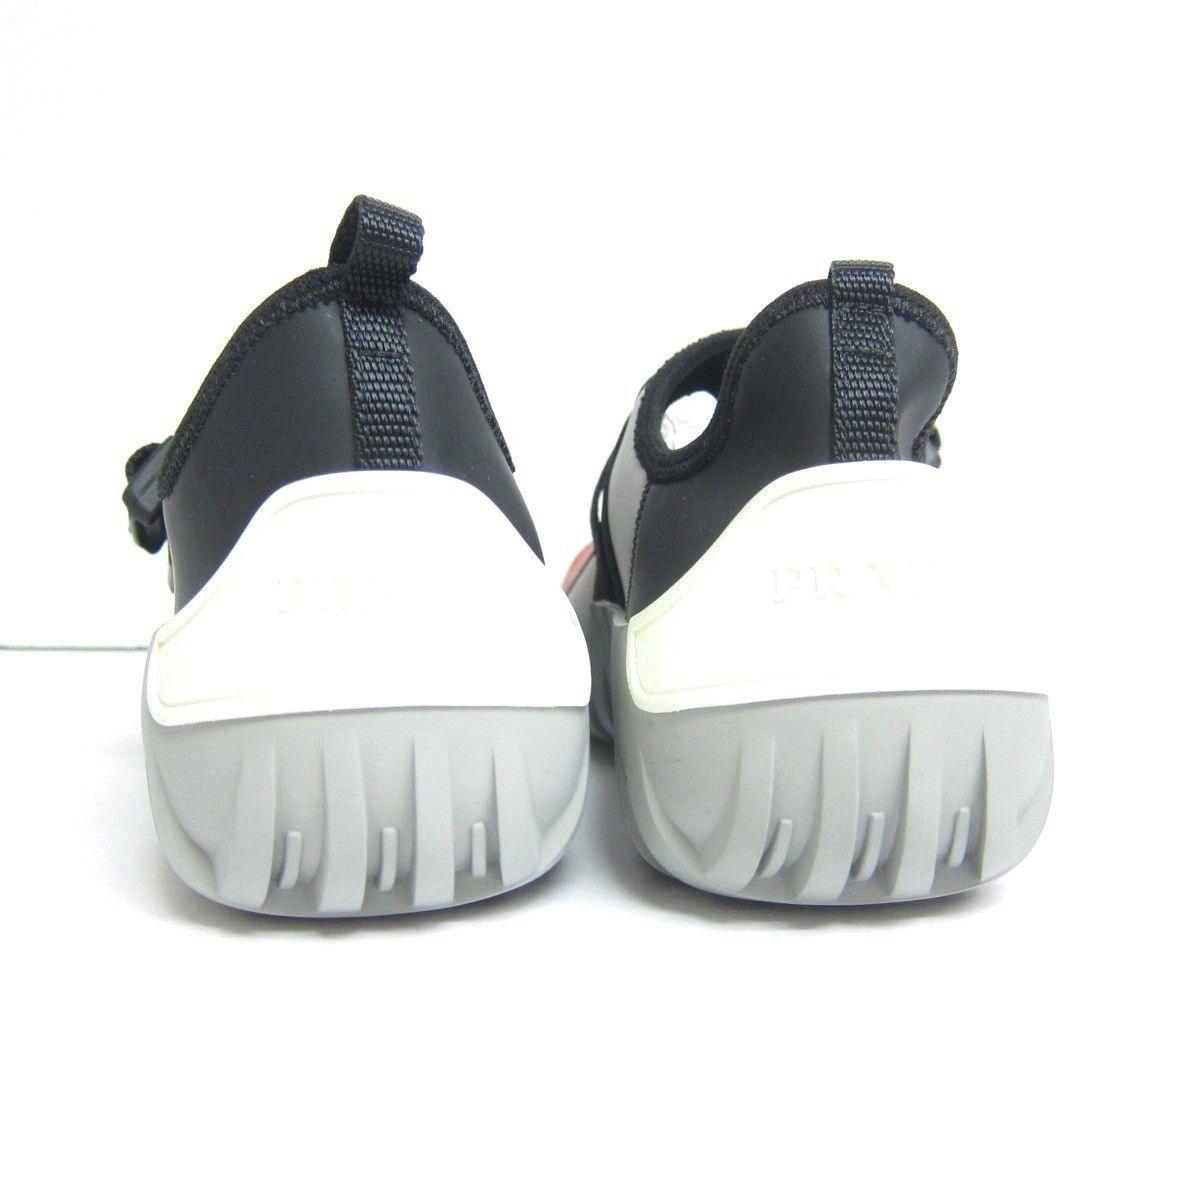 P-537248 New Prada Red Black Slip-on Sneakers Neoprene Buckle Clasp US 7 UK 6